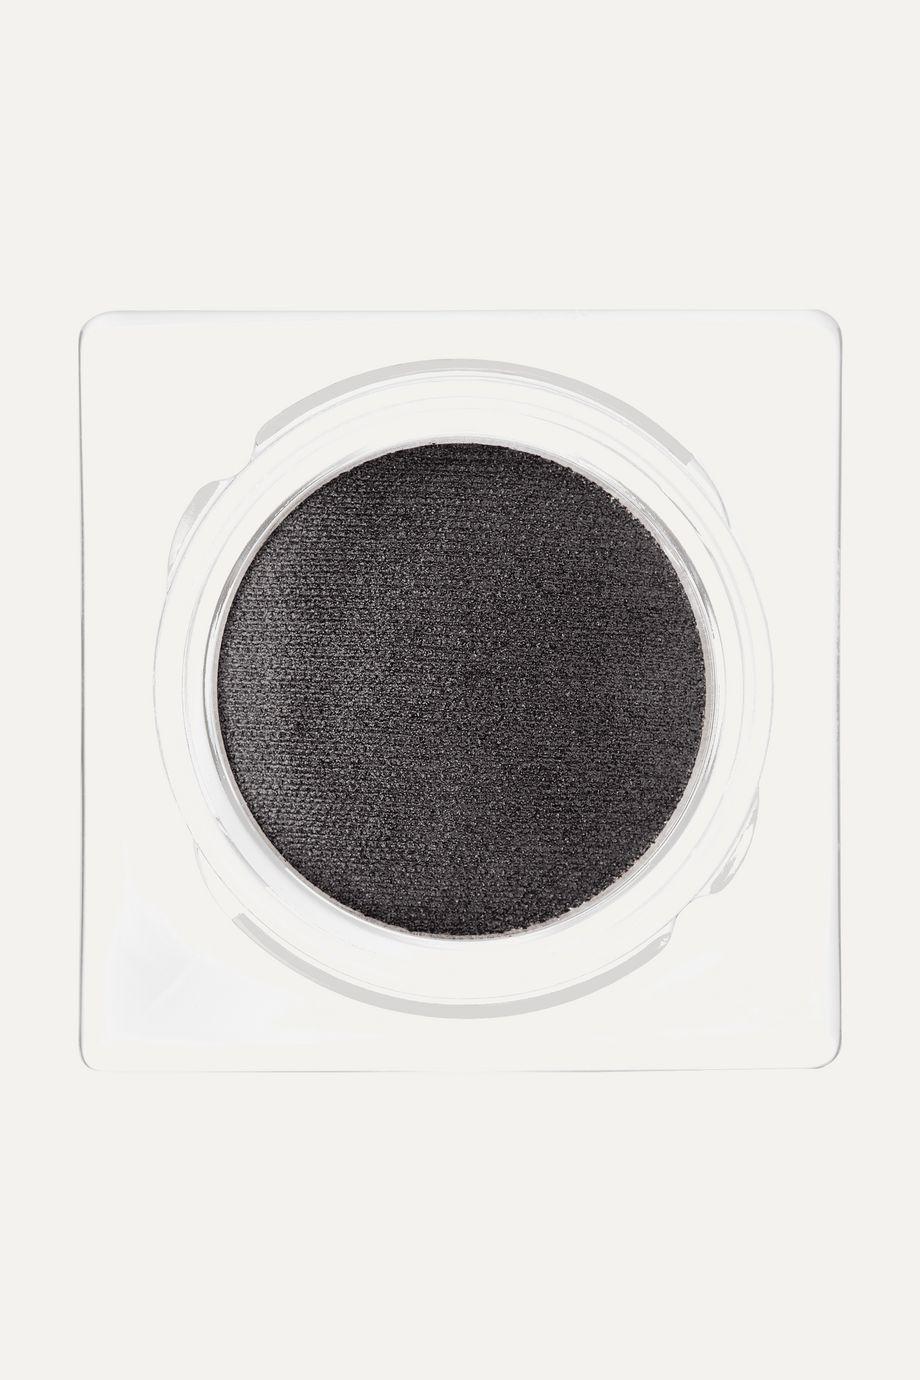 Burberry Beauty Eye Color Cream - Charcoal  No.114